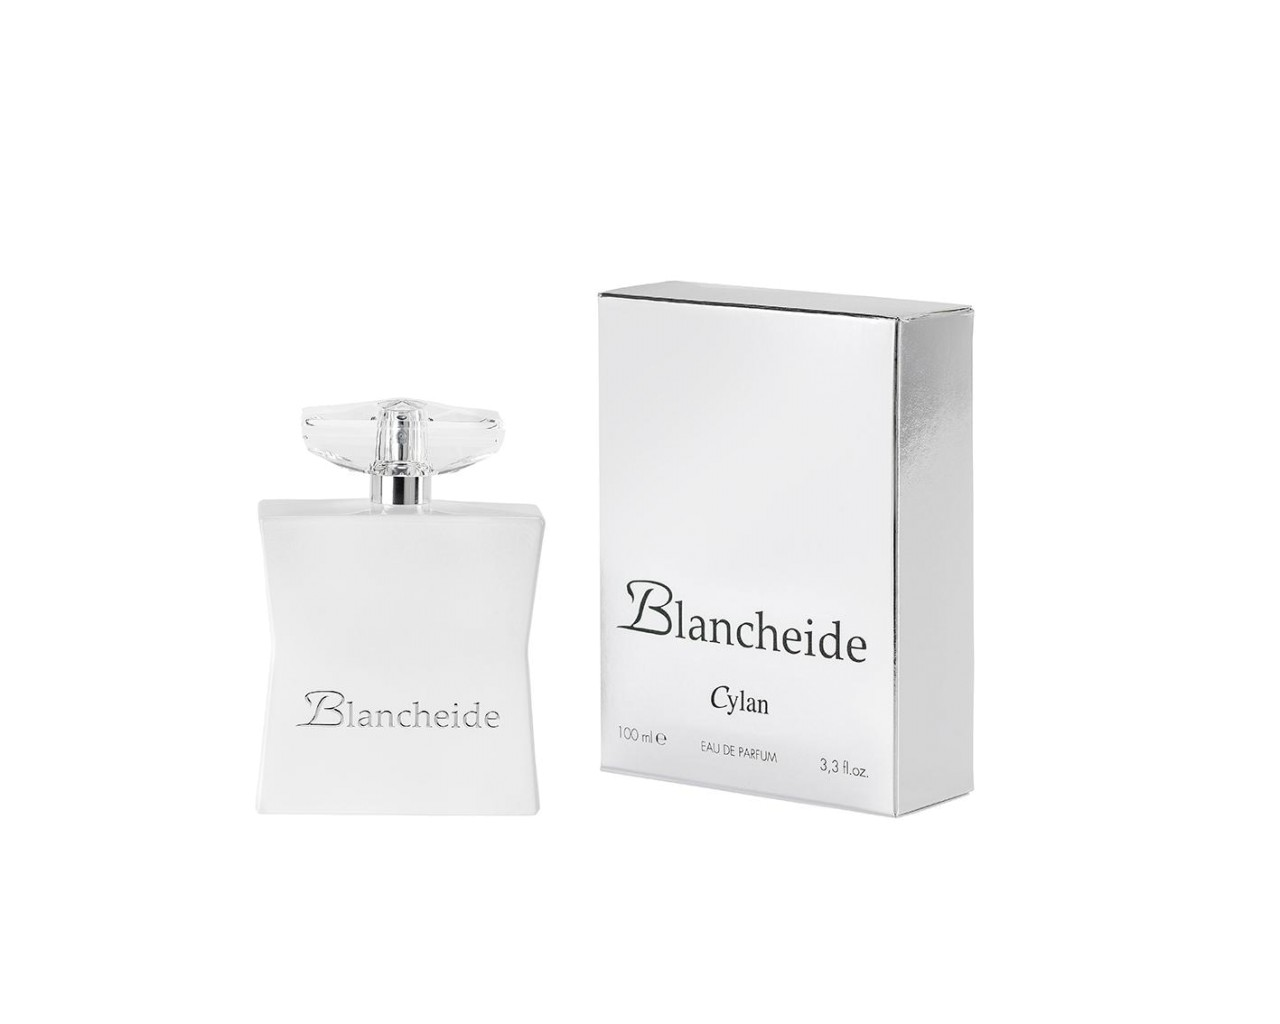 CYLAN BLANCHEIDE EDP 100 ML Blancheide BLAV100CY-01